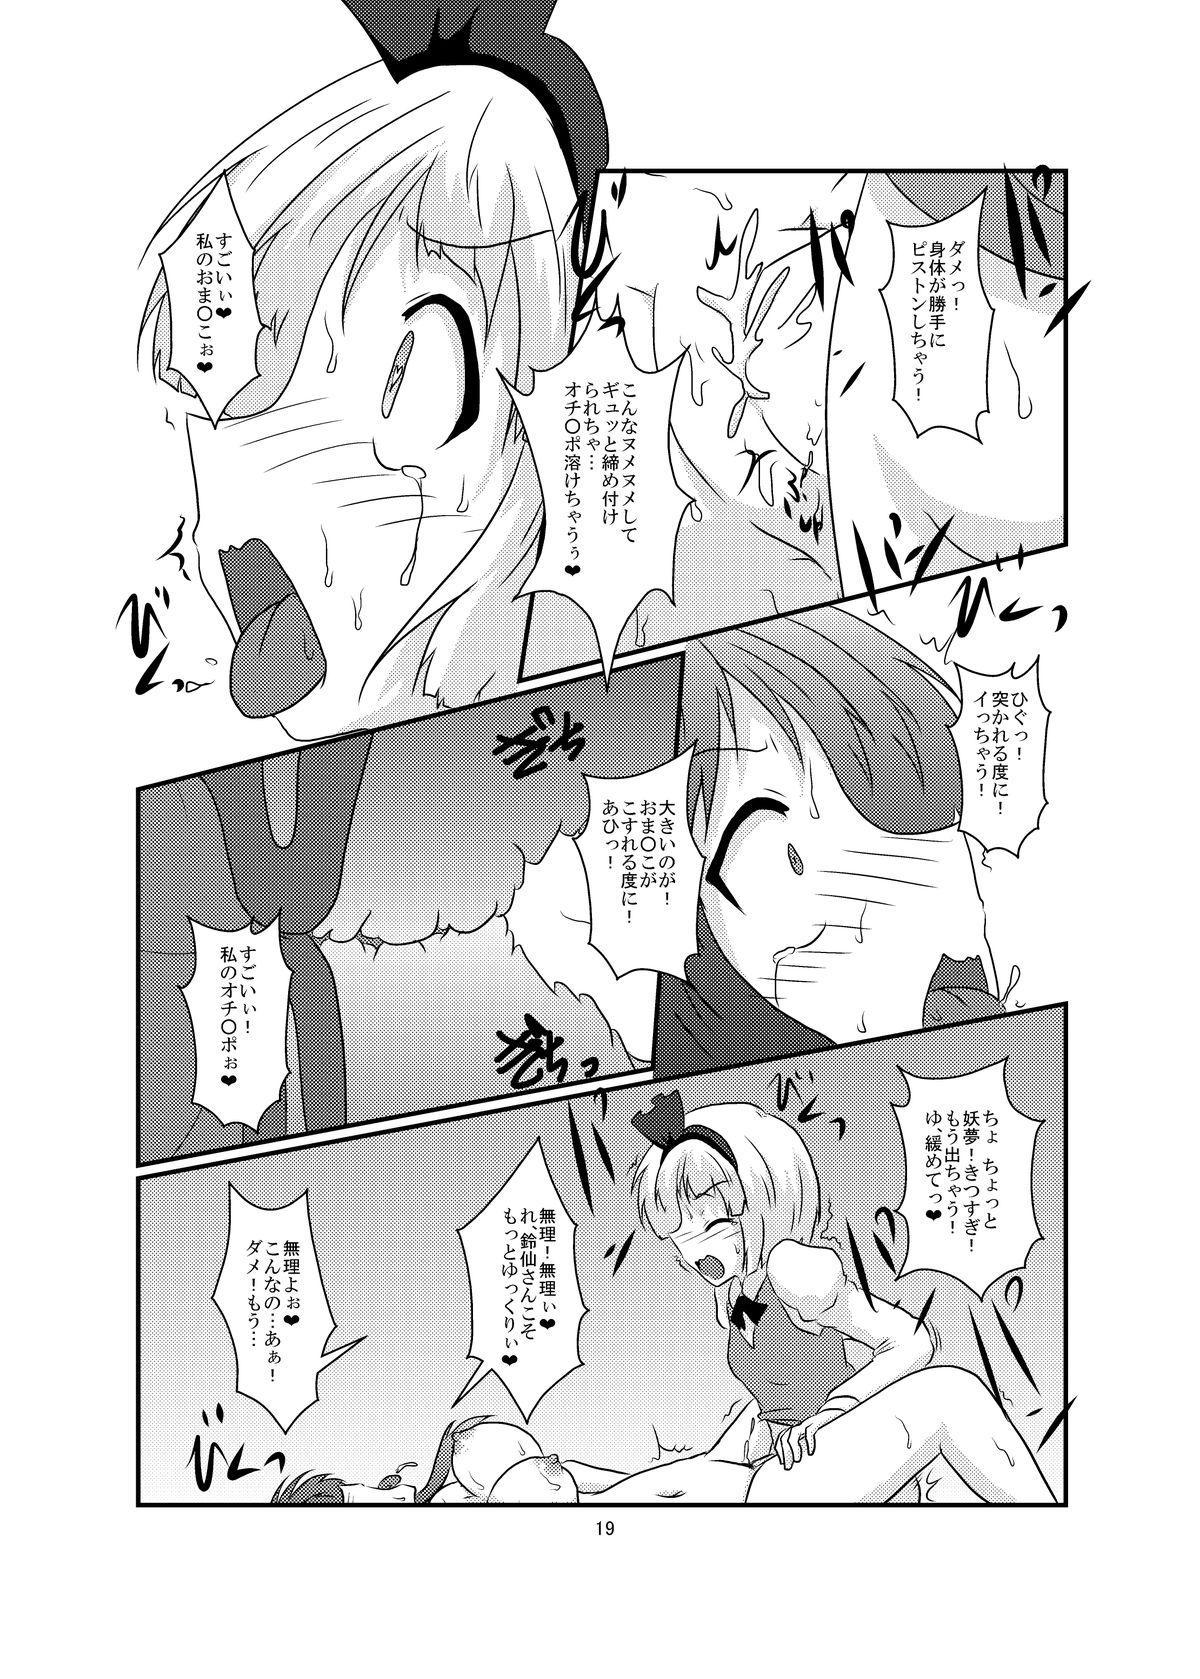 Gyokuto ga Hanjin de Hanjin ga Gyokuto de 18